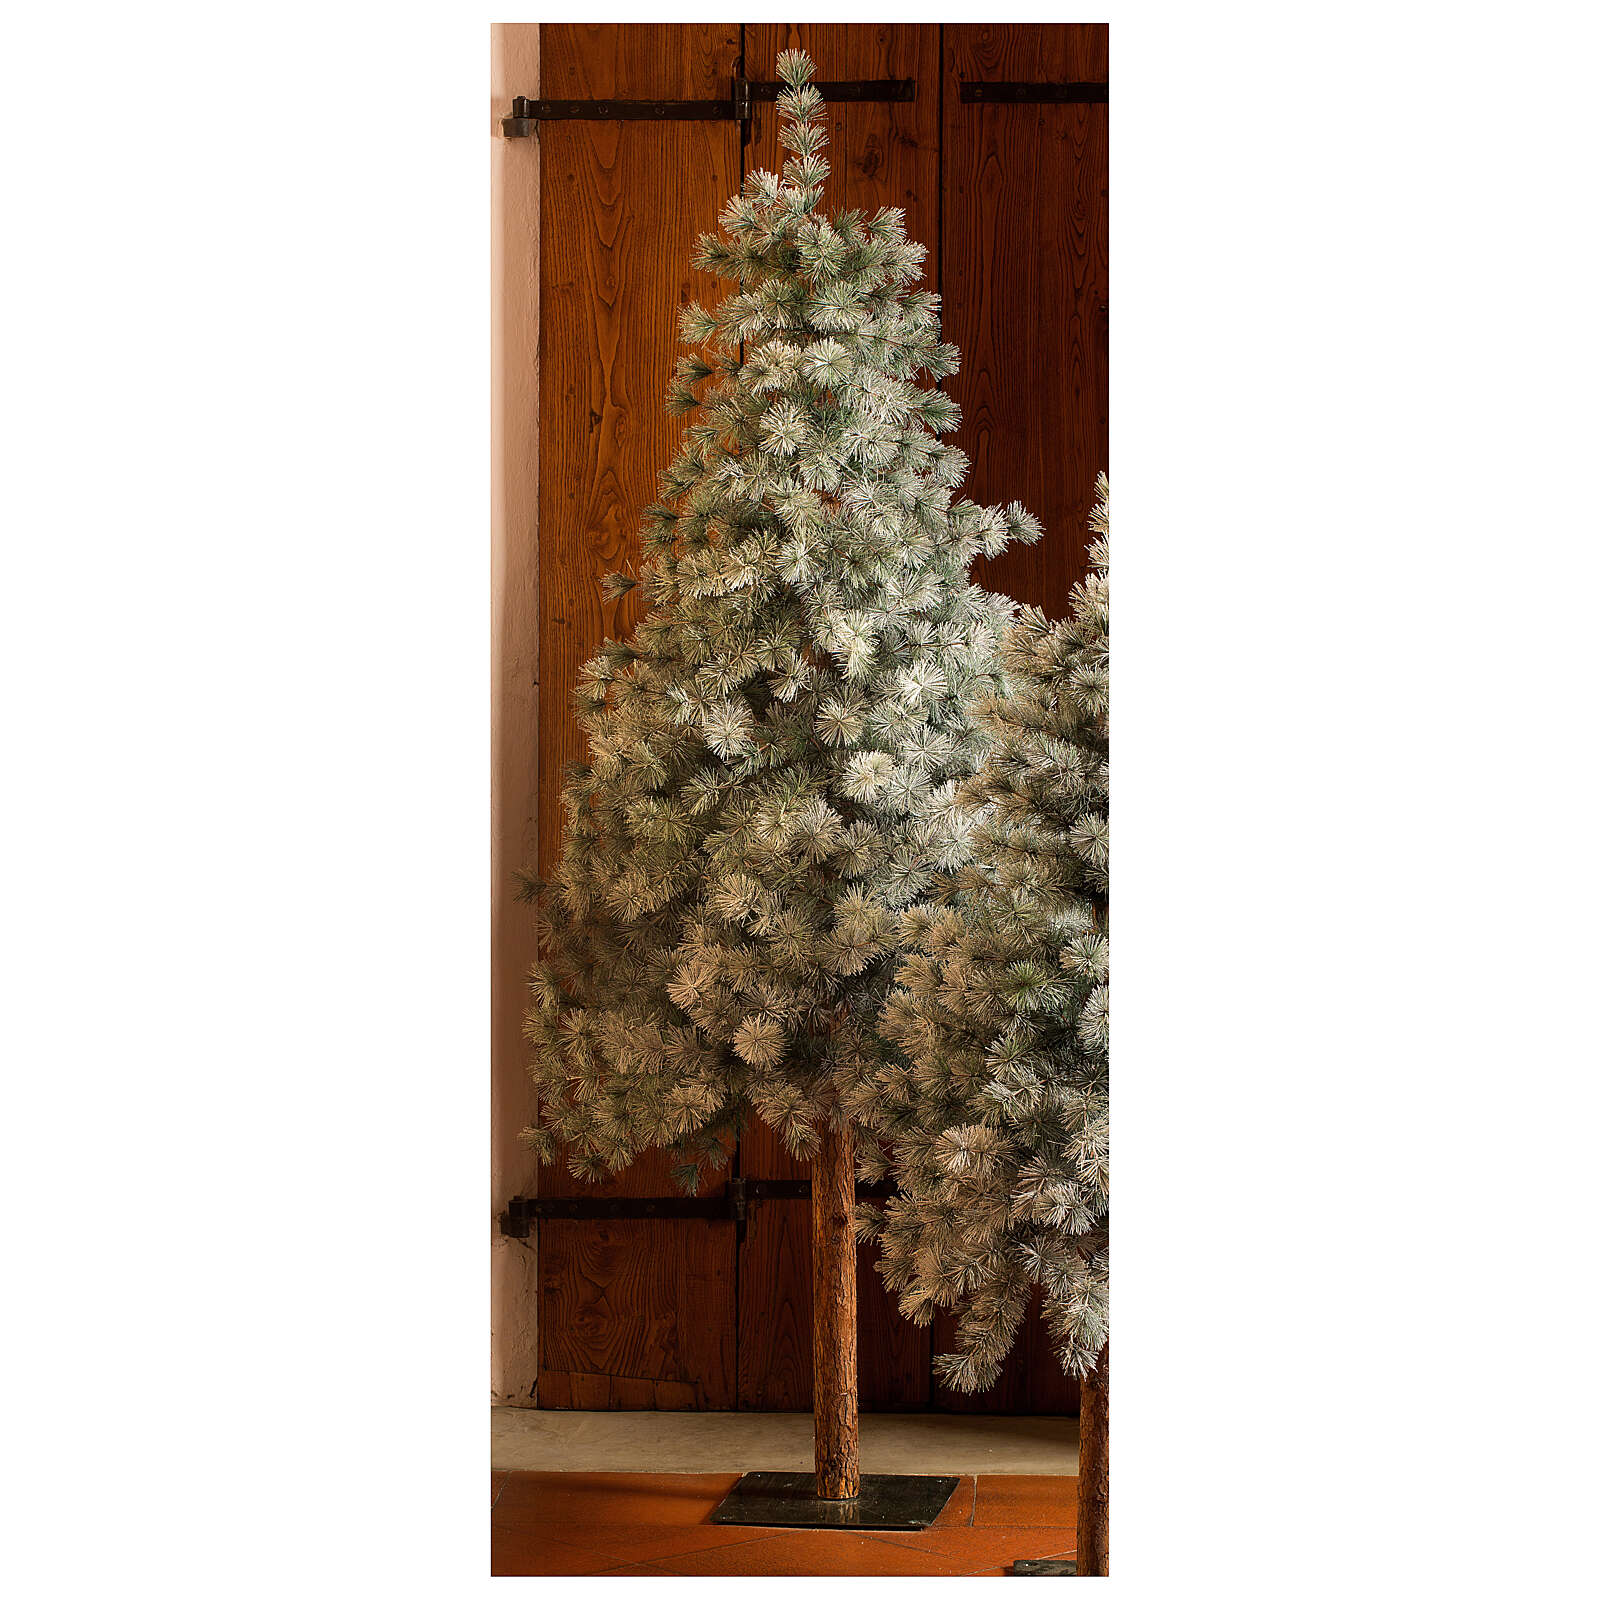 STOCK Snowy Aspen Pine Christmas tree 210 cm 3